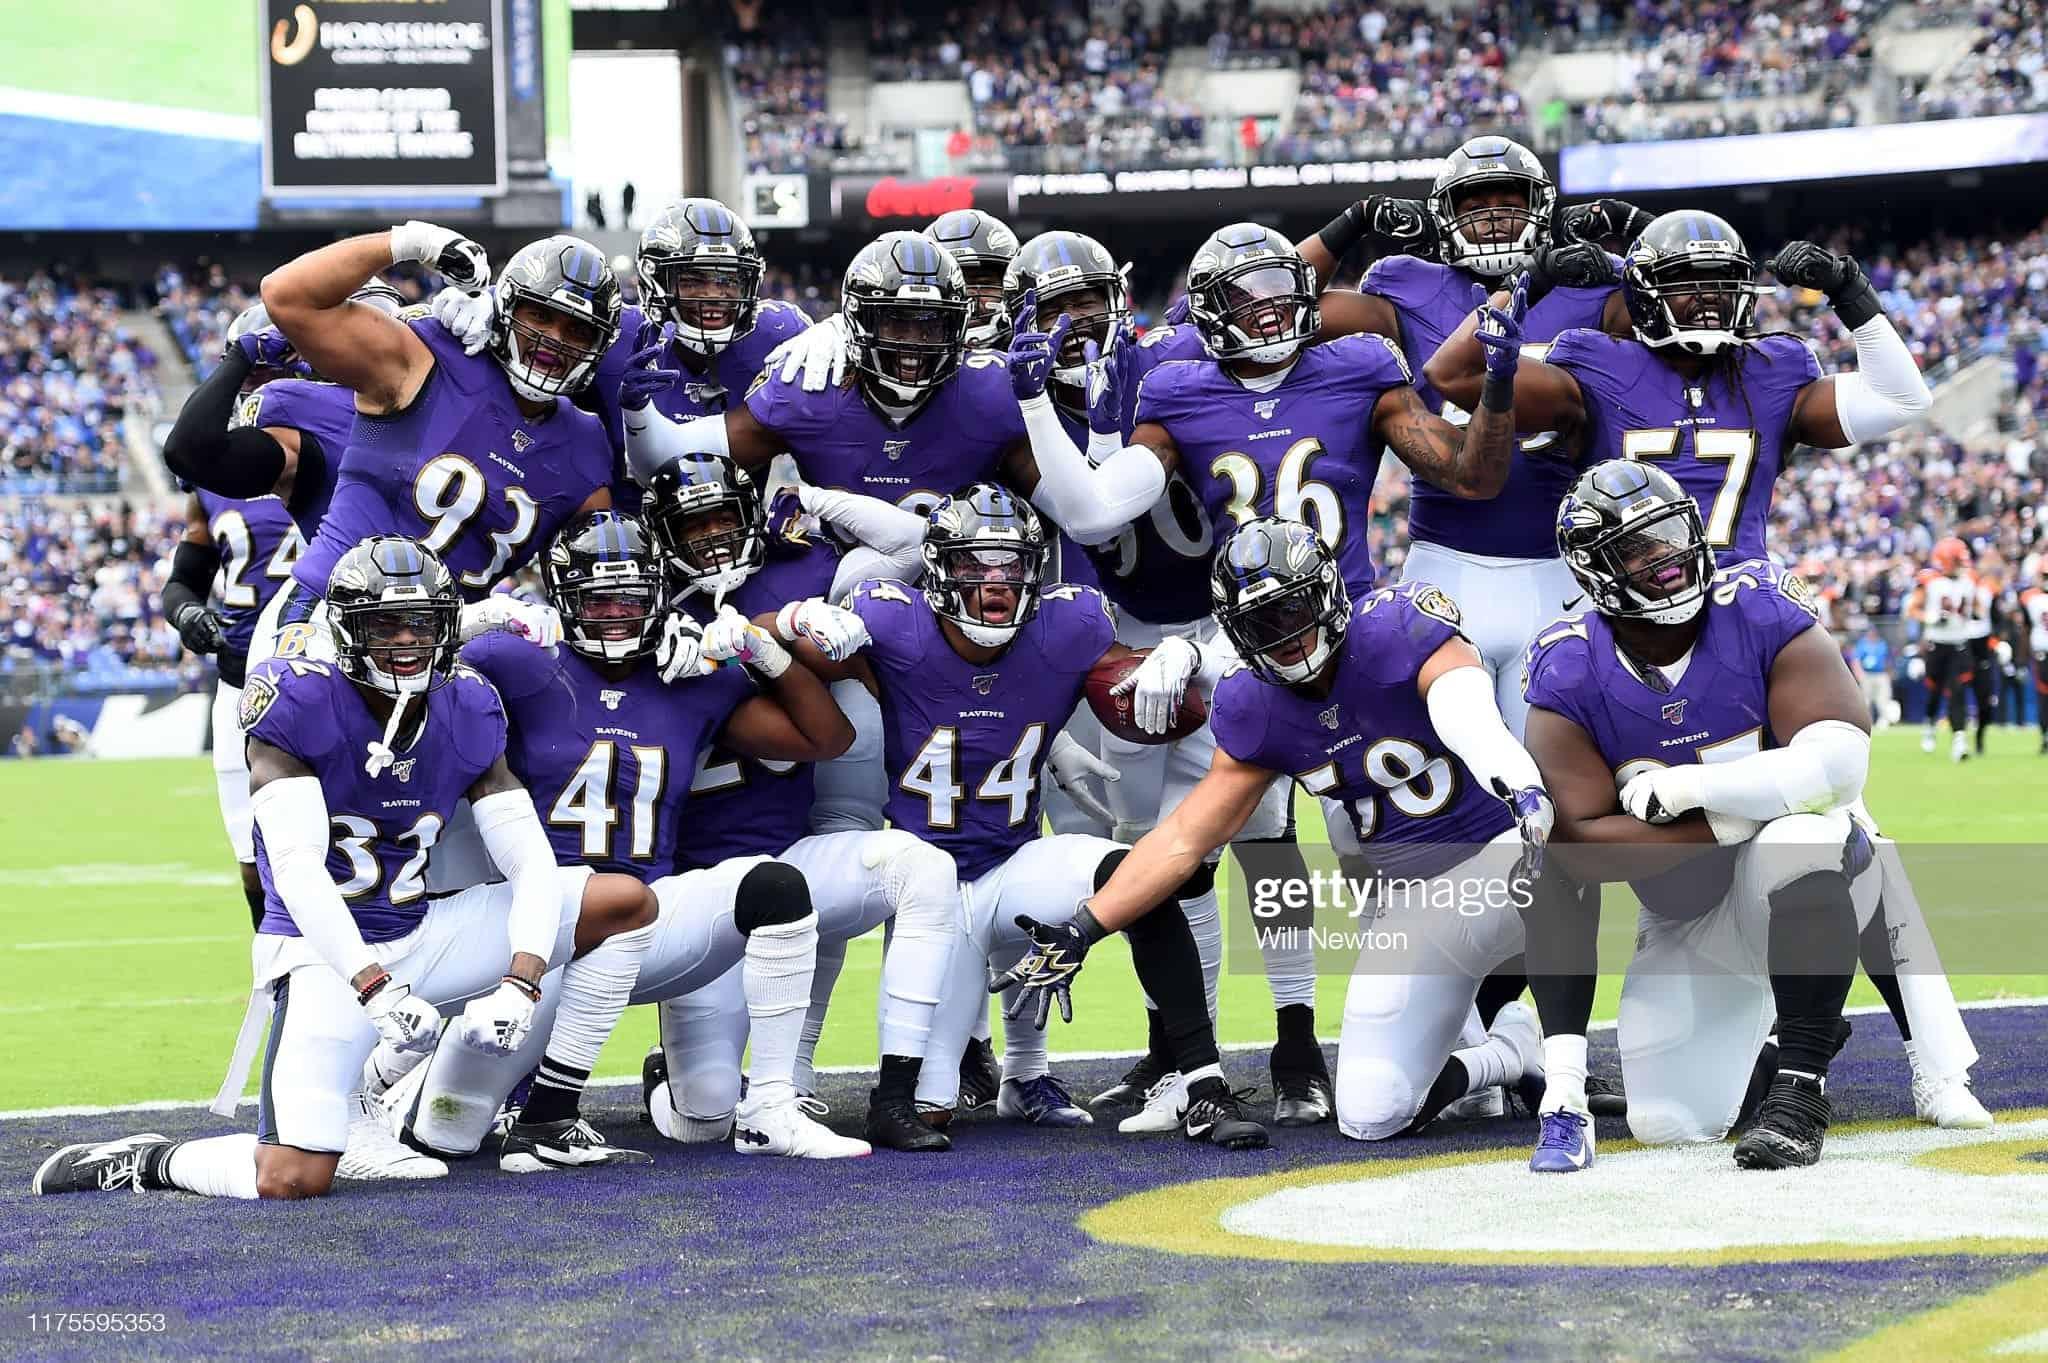 2021 NFL Predictions: Ravens